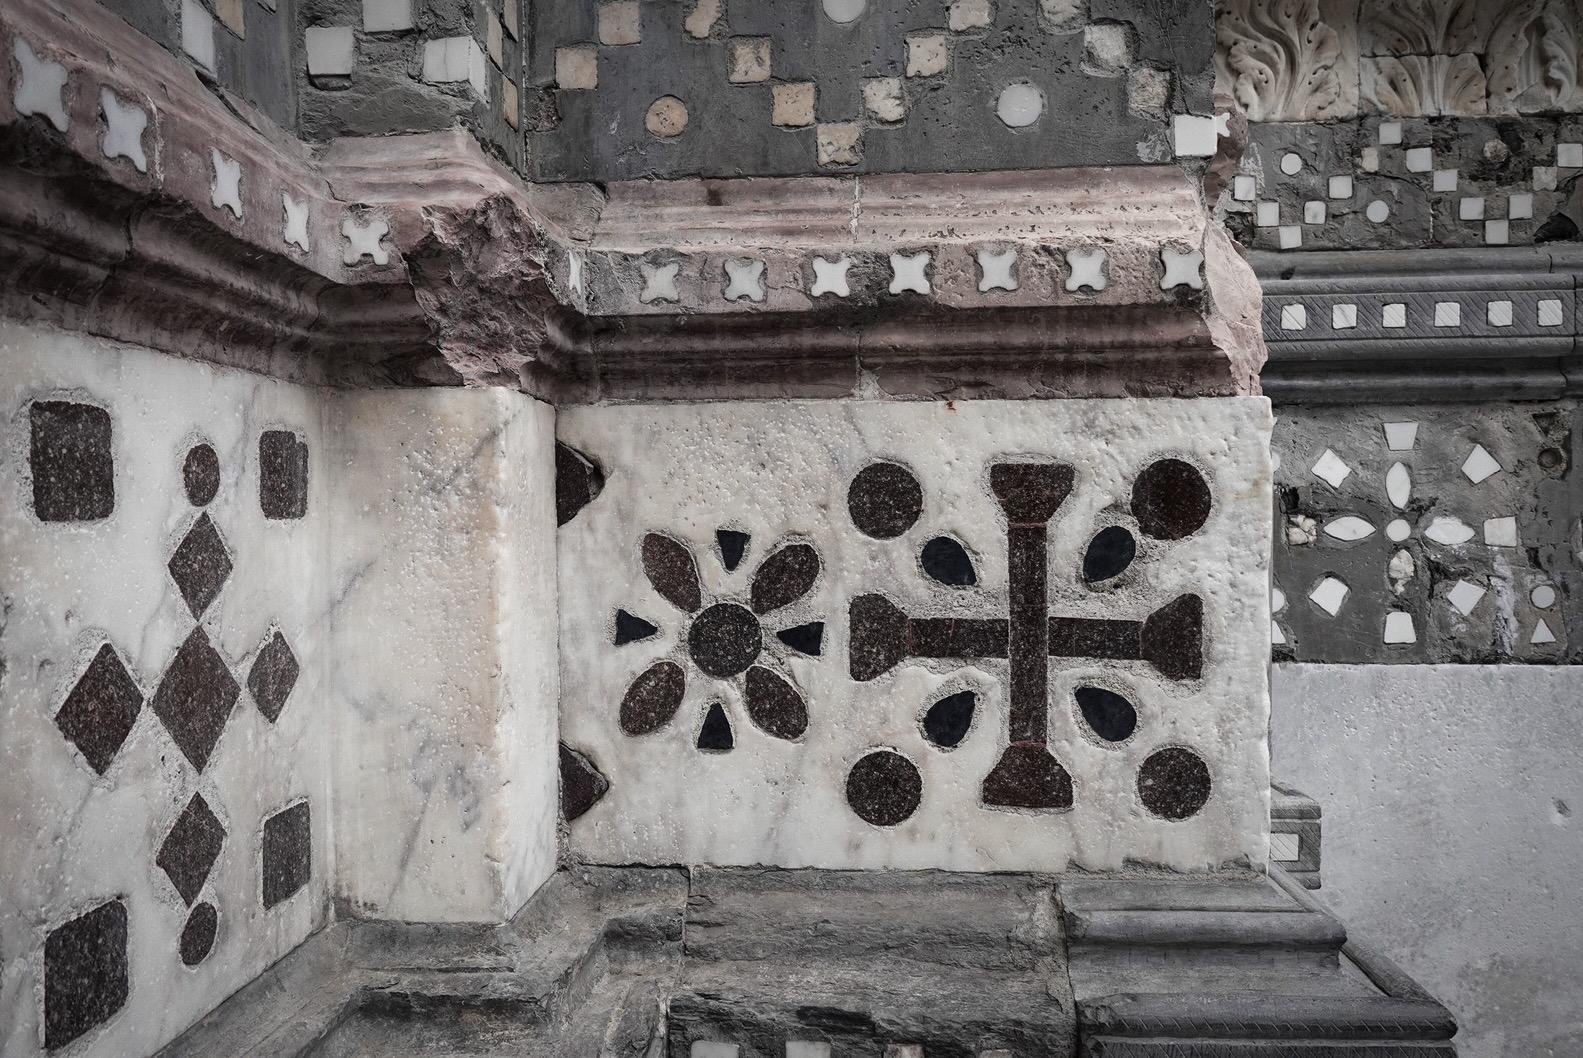 Gevel van de San Lorenzokathedraal (detail), Genua